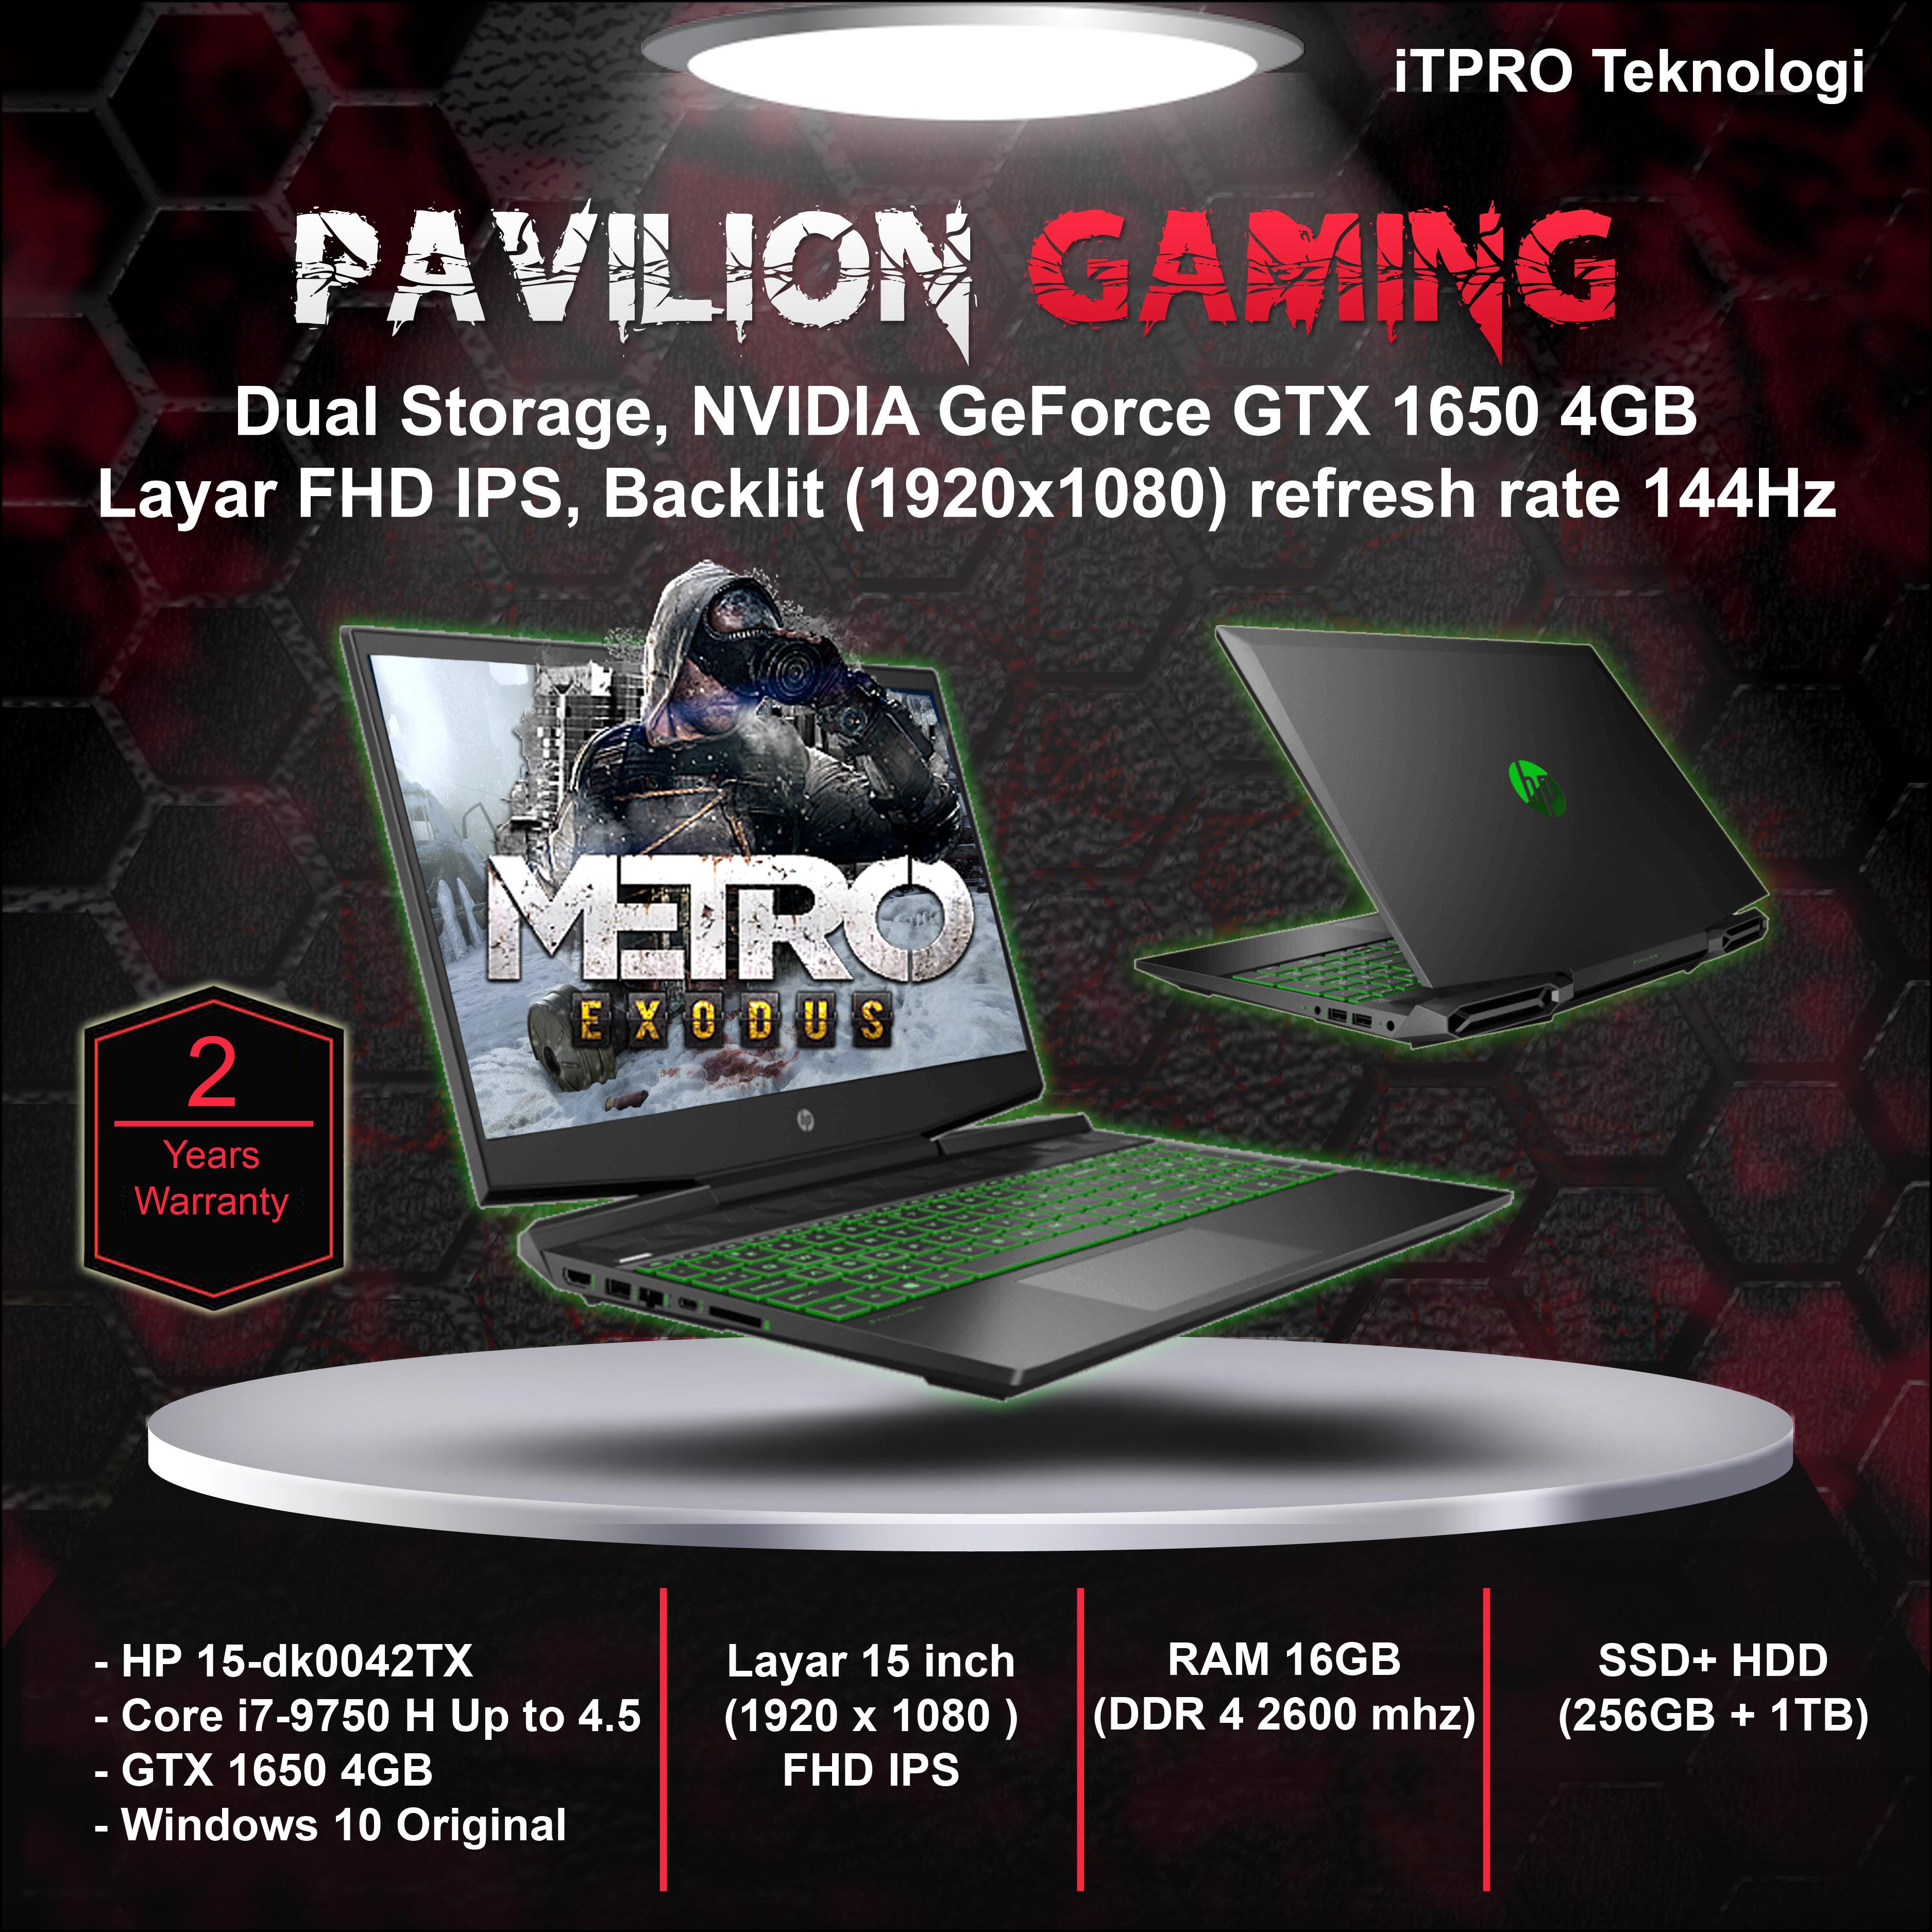 https://www.lazada.co.id/products/ekslusive-produk-monster-gaming-anti-lag-hp-pavilion-15-dk0042tx-intel-core-i7-9750h-ram-16gb-ssd-256gb-1tb-gtx-1650-4gb-w10-garansi-resmi-i517400880-s1303700455.html